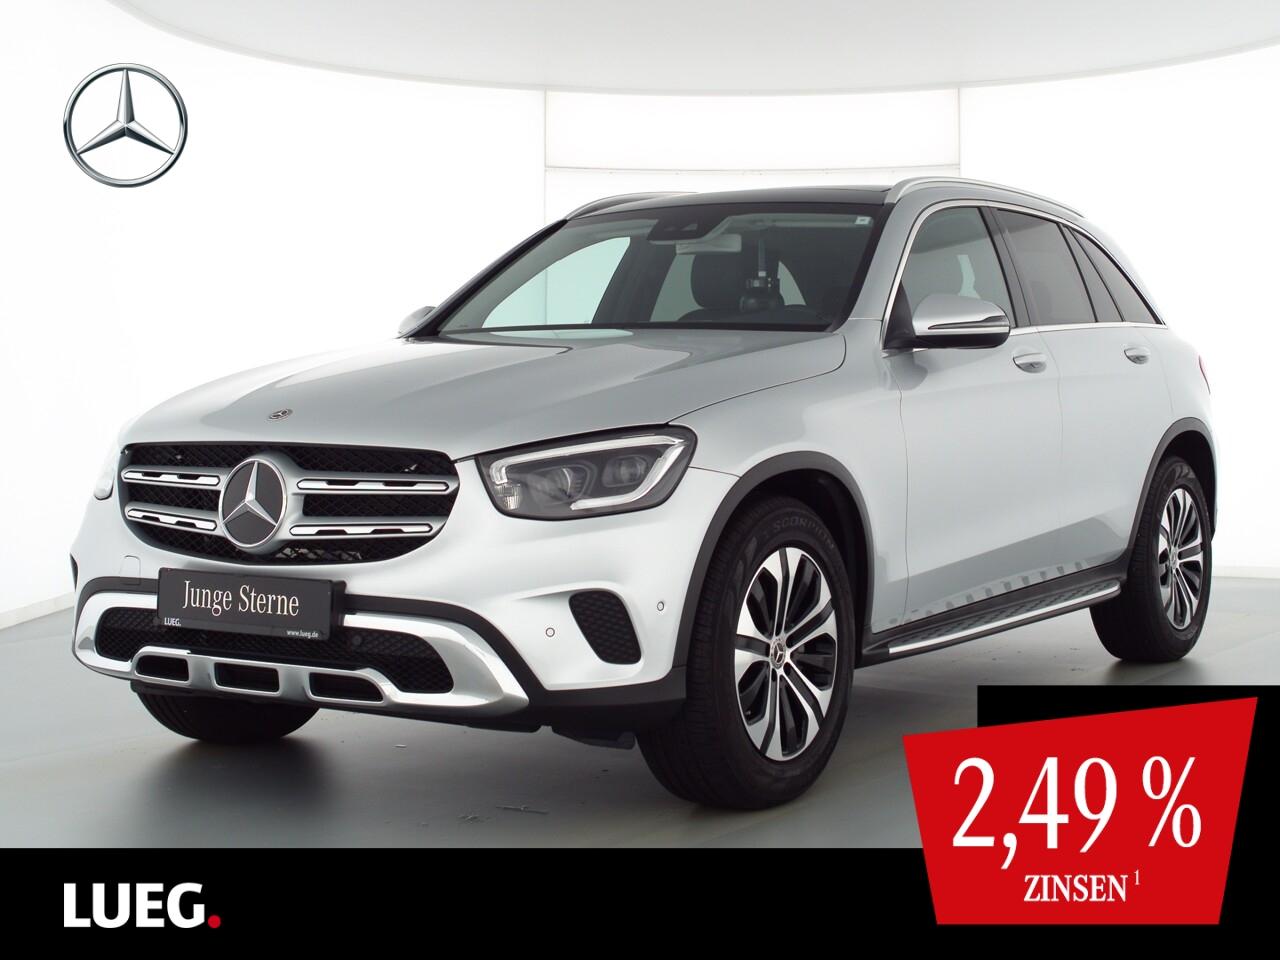 Mercedes-Benz GLC 200 4M MBUX+Pano+Mbeam+AHK+SpurPt+EHeckk+RFK, Jahr 2020, Benzin